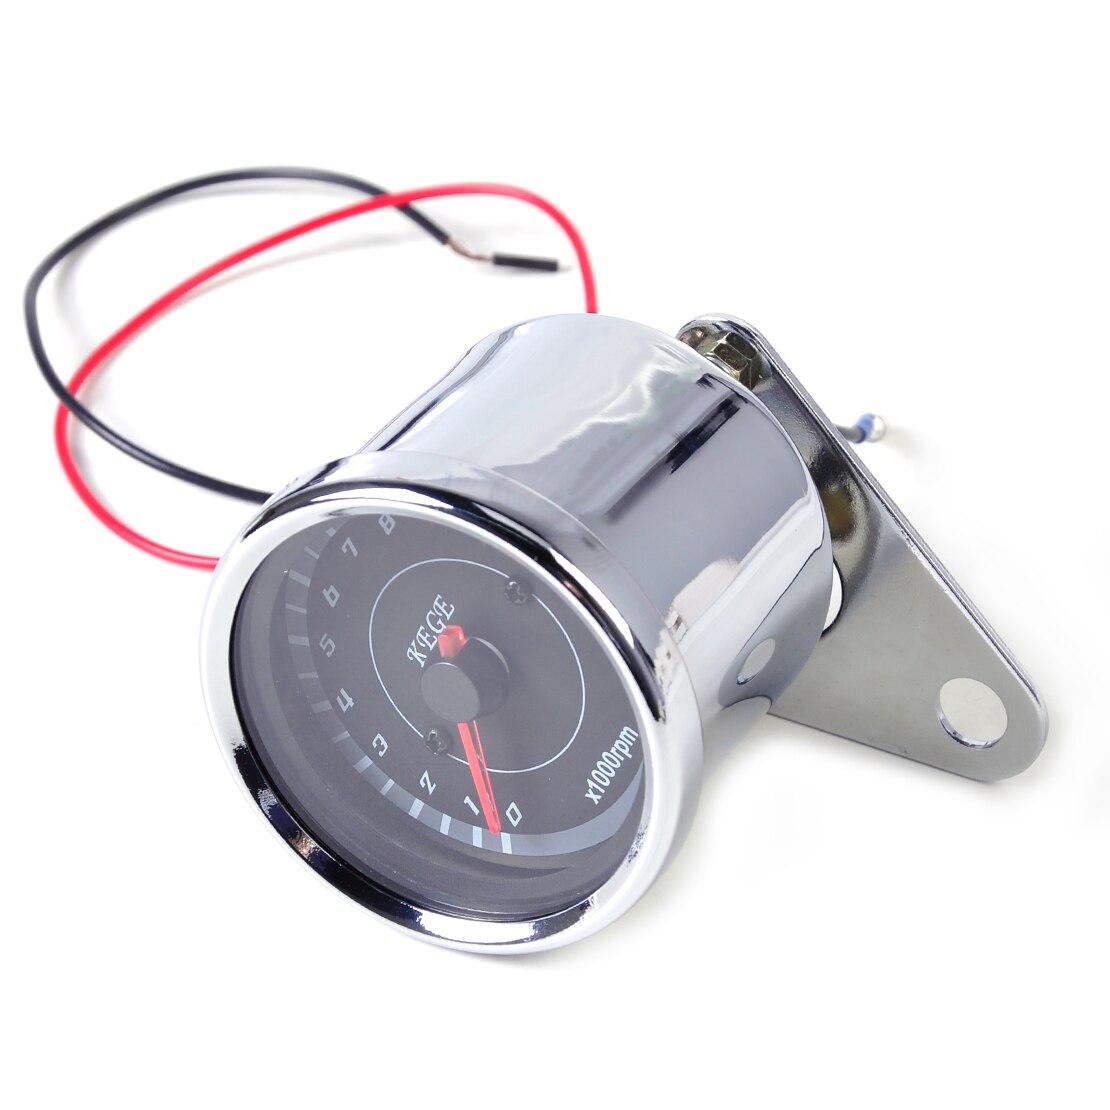 1:4 Chrome /& Black Mini Mechanical Motorcycle Tachometer Tach 12K RPM